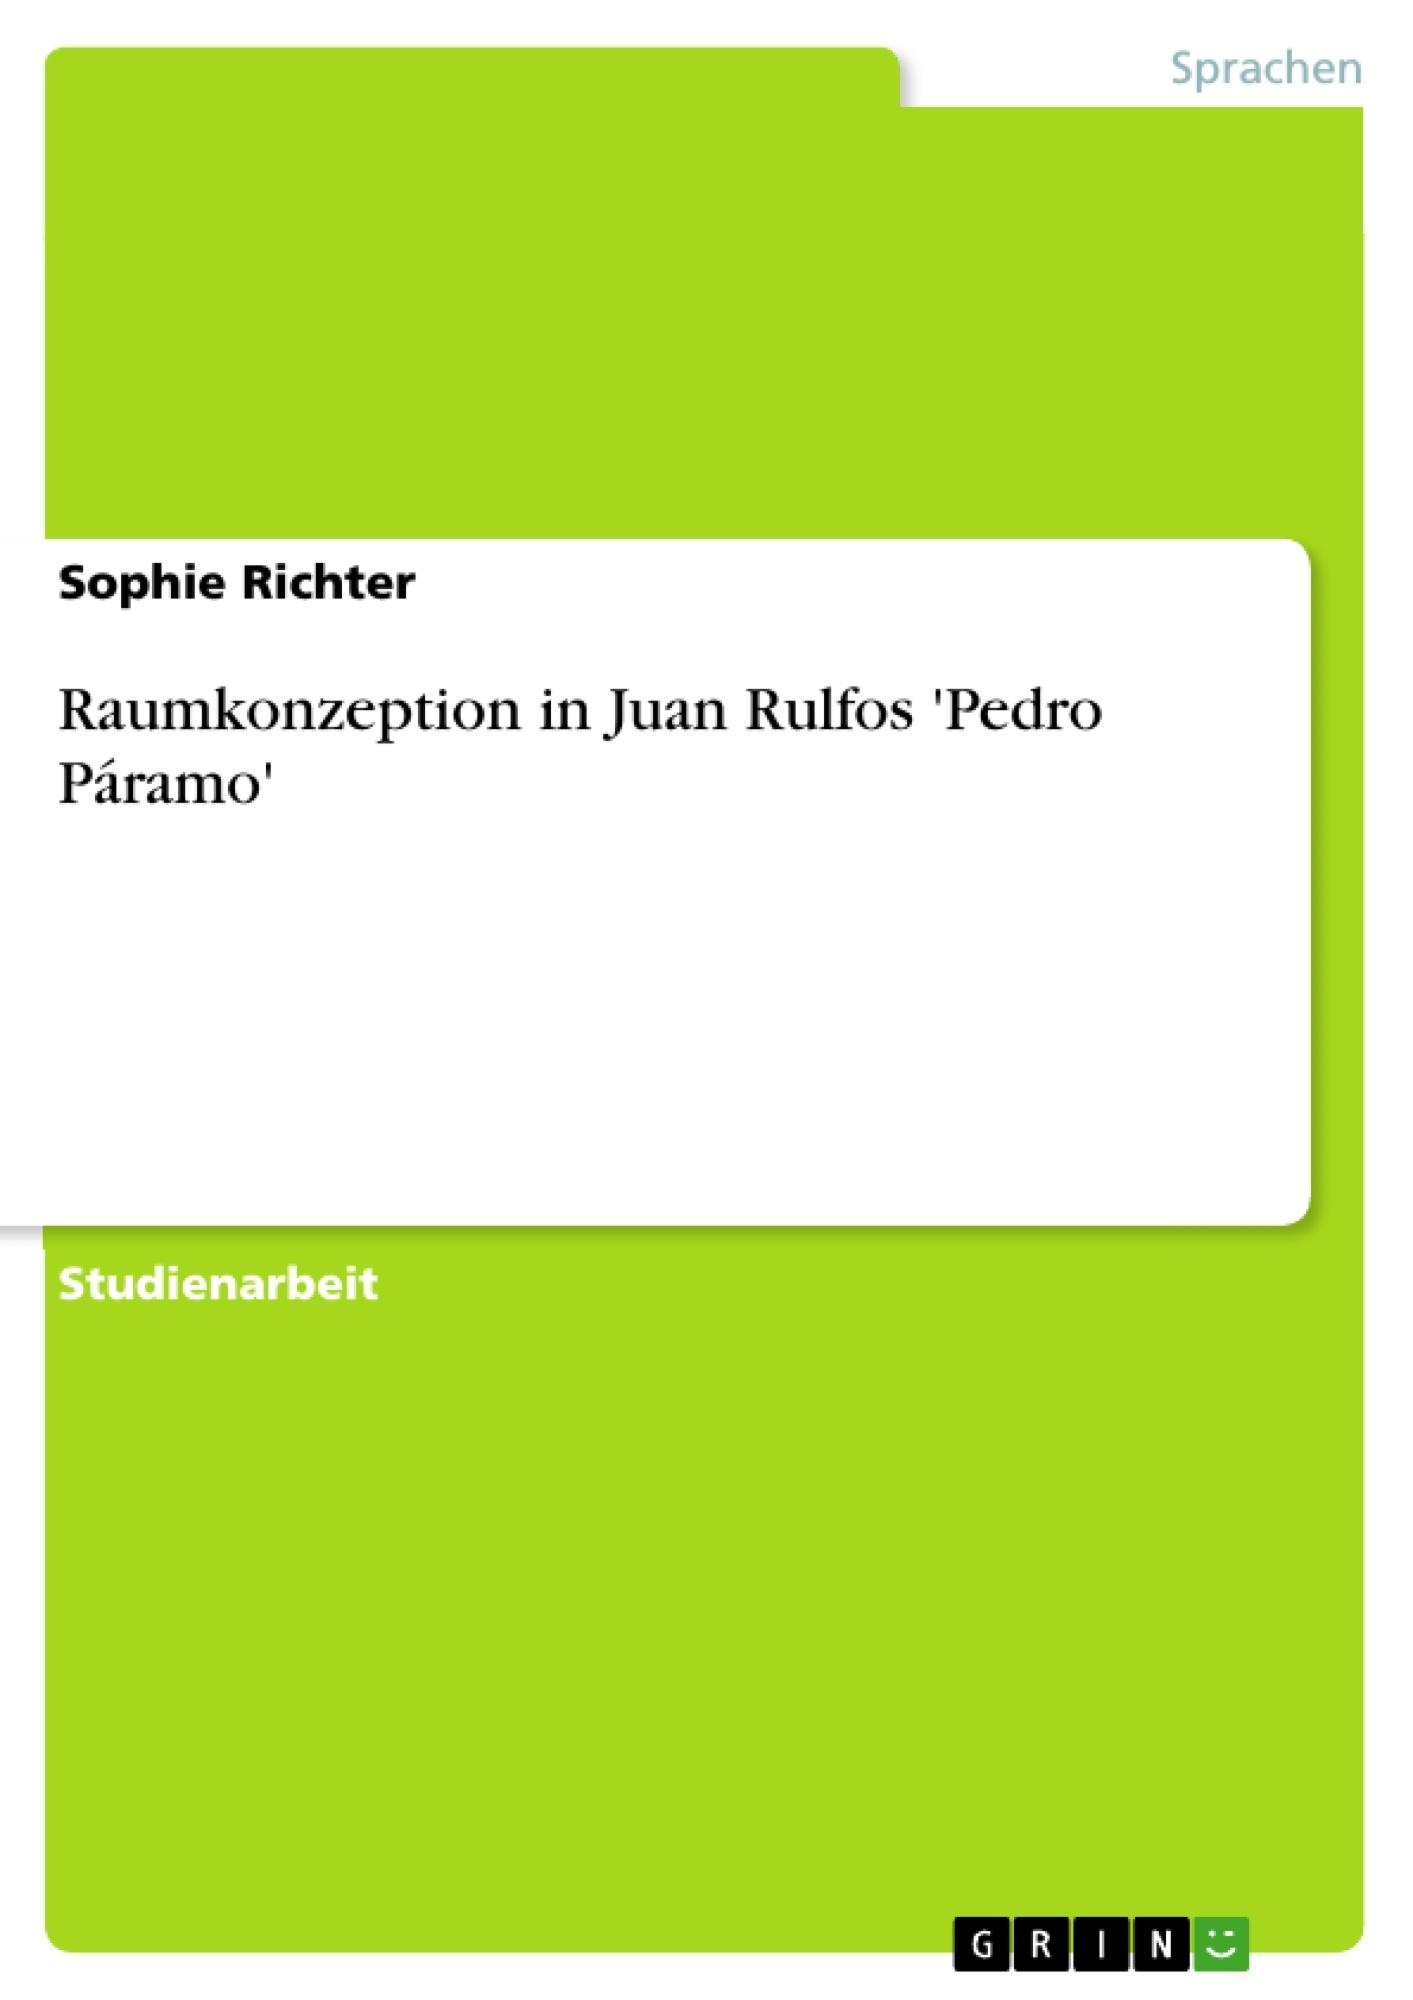 Titel: Raumkonzeption in Juan Rulfos 'Pedro Páramo'